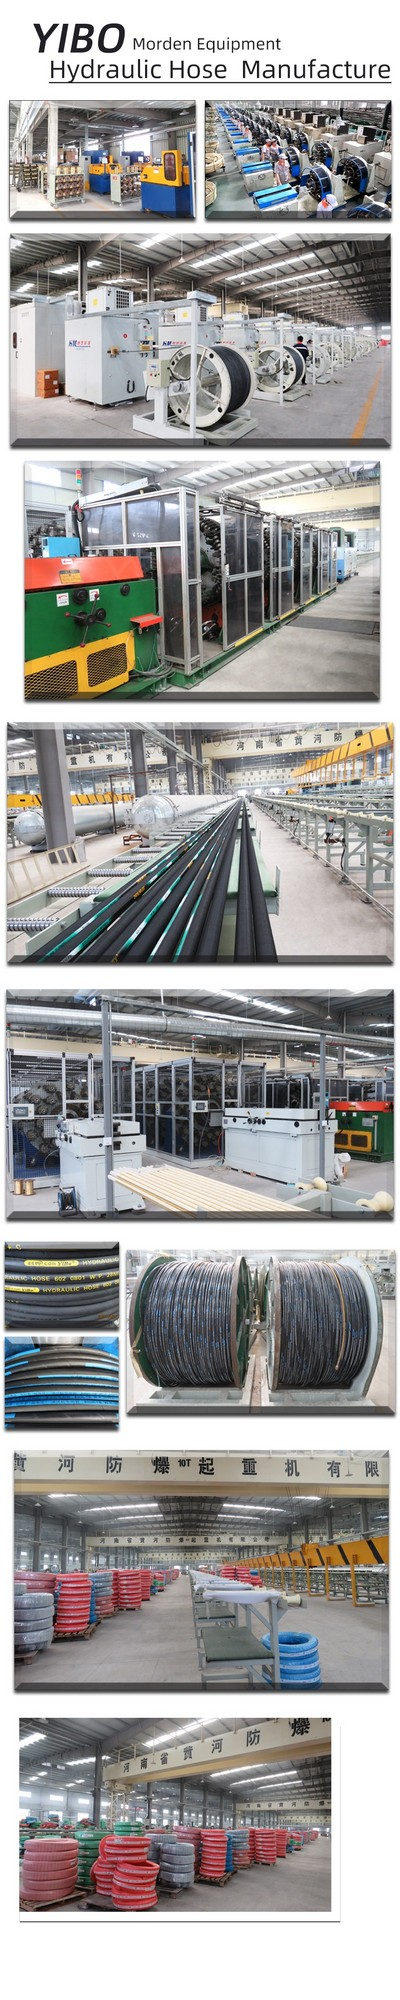 sae 100r19 compact wire braid hydraulic rubber hose 5